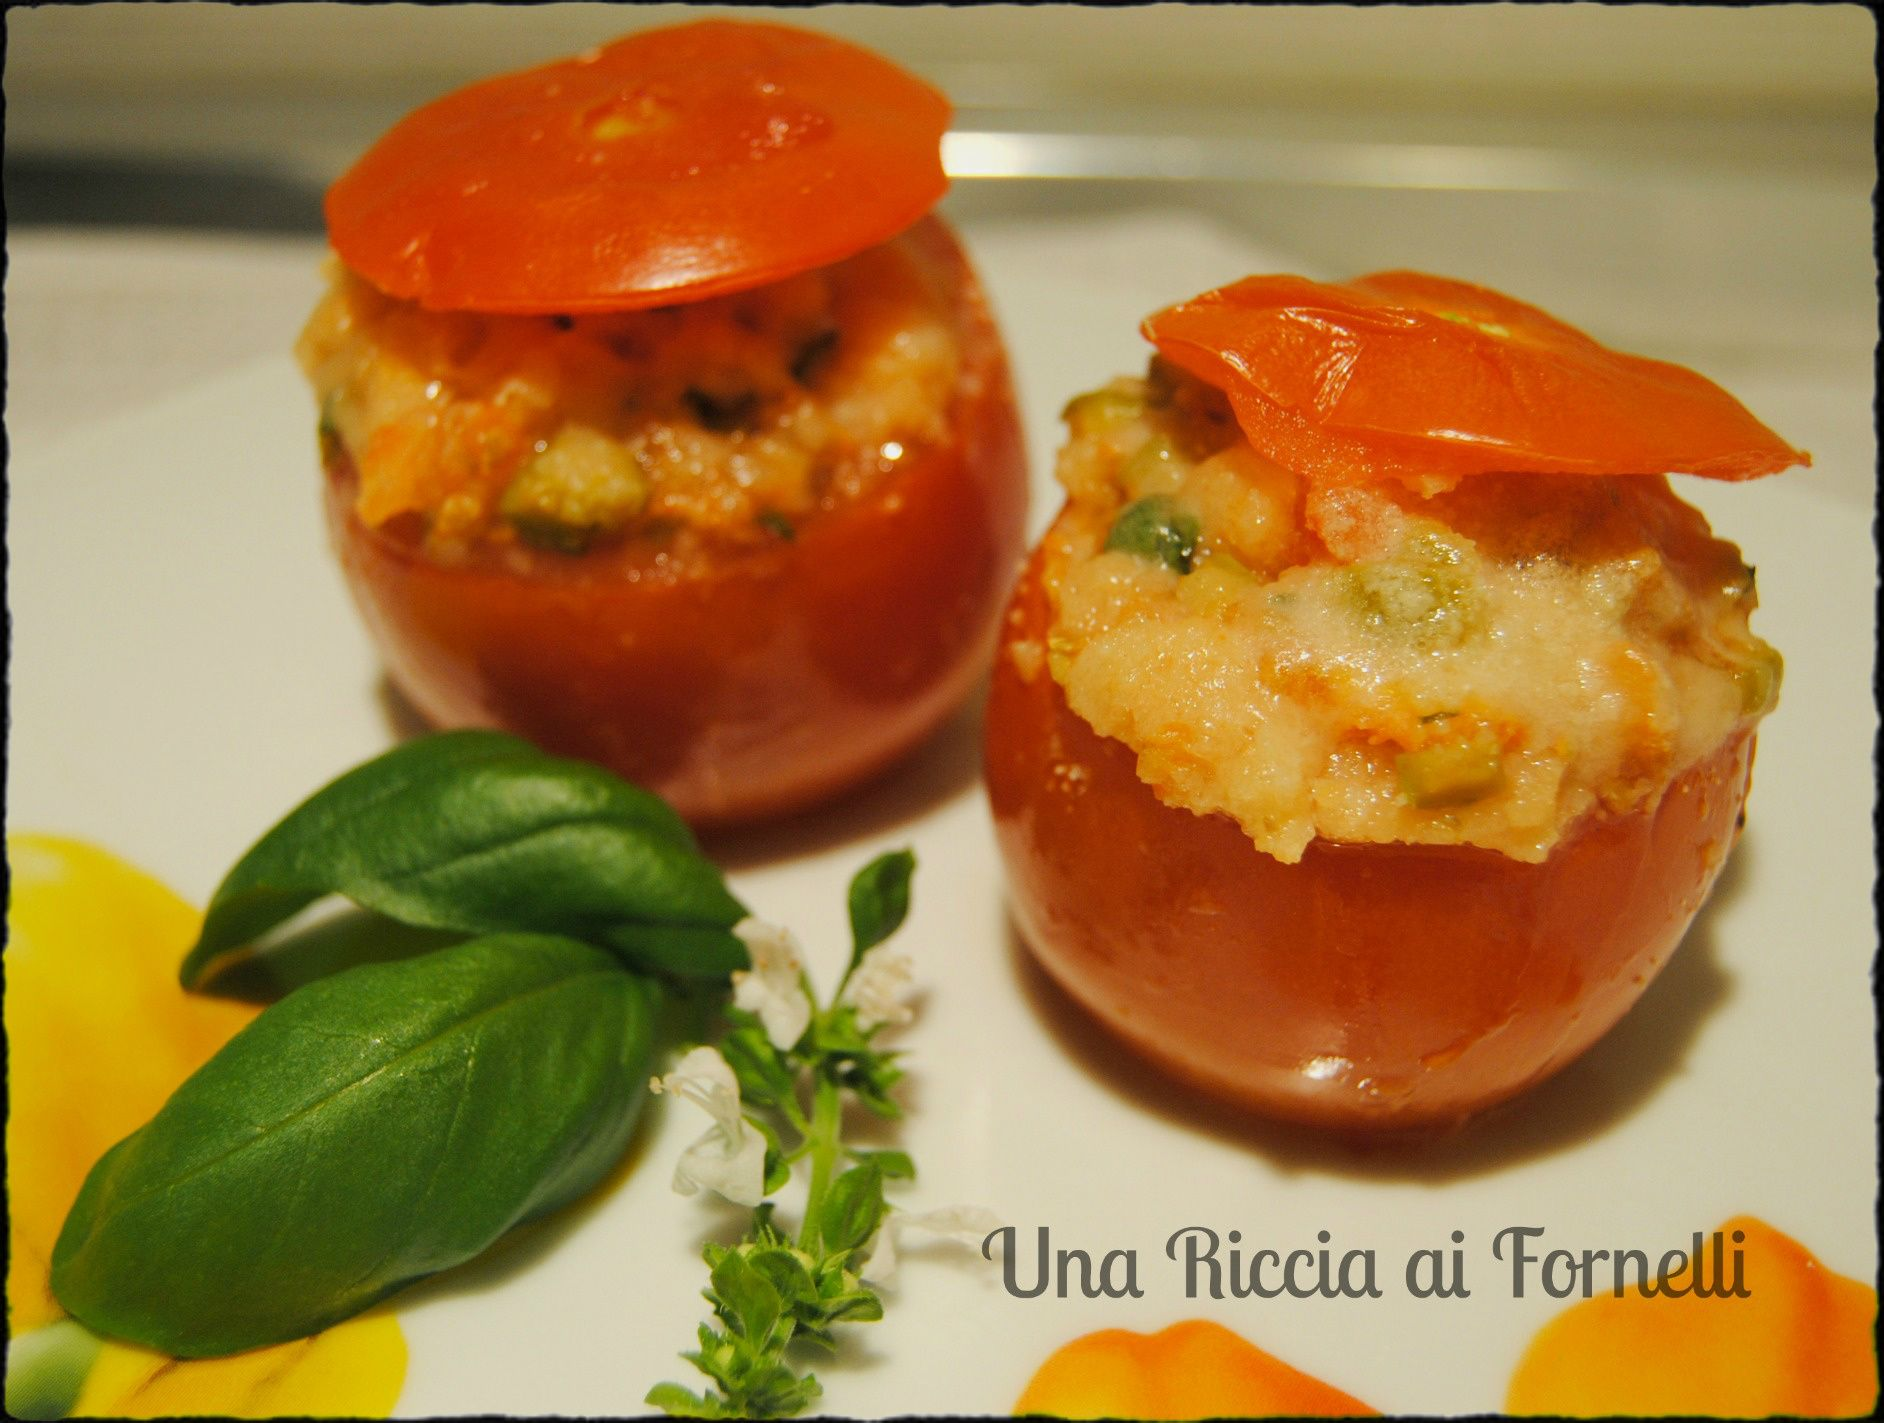 Pomodori ripieni al microonde ricetta microonde ricetta pomodori ricette al microonde - Cucinare a microonde ...